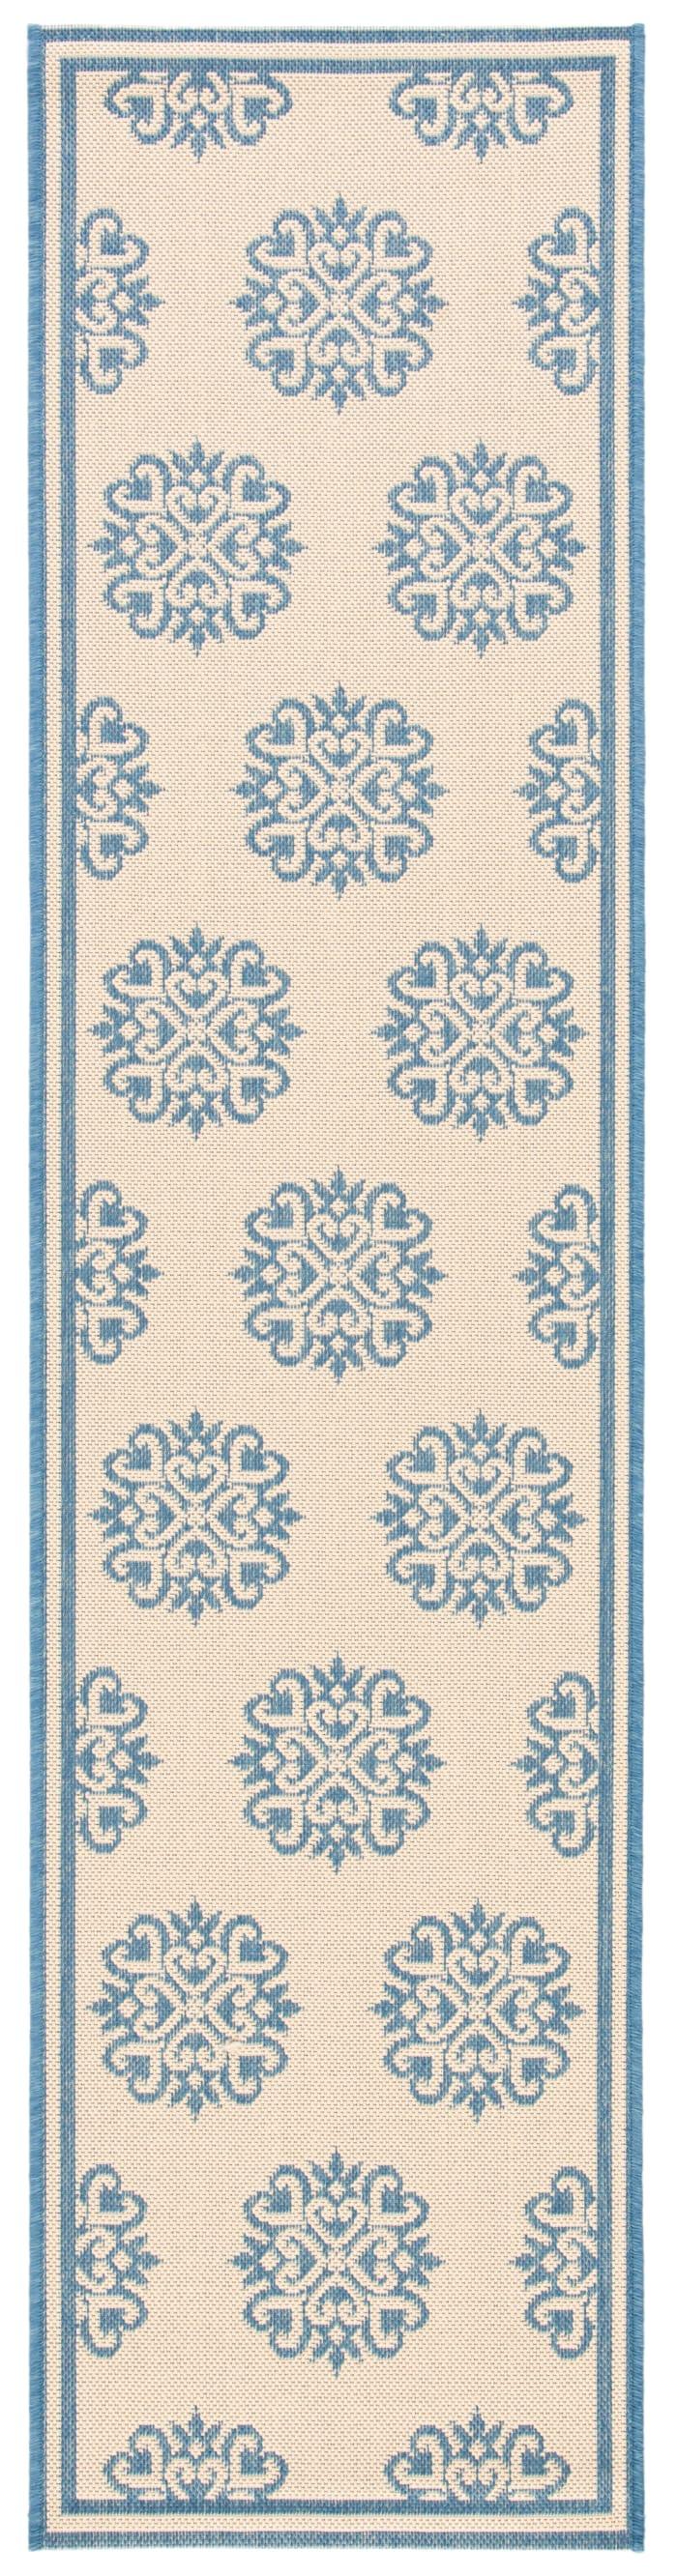 Blue Polypropylene Rug 2.5' x 9'